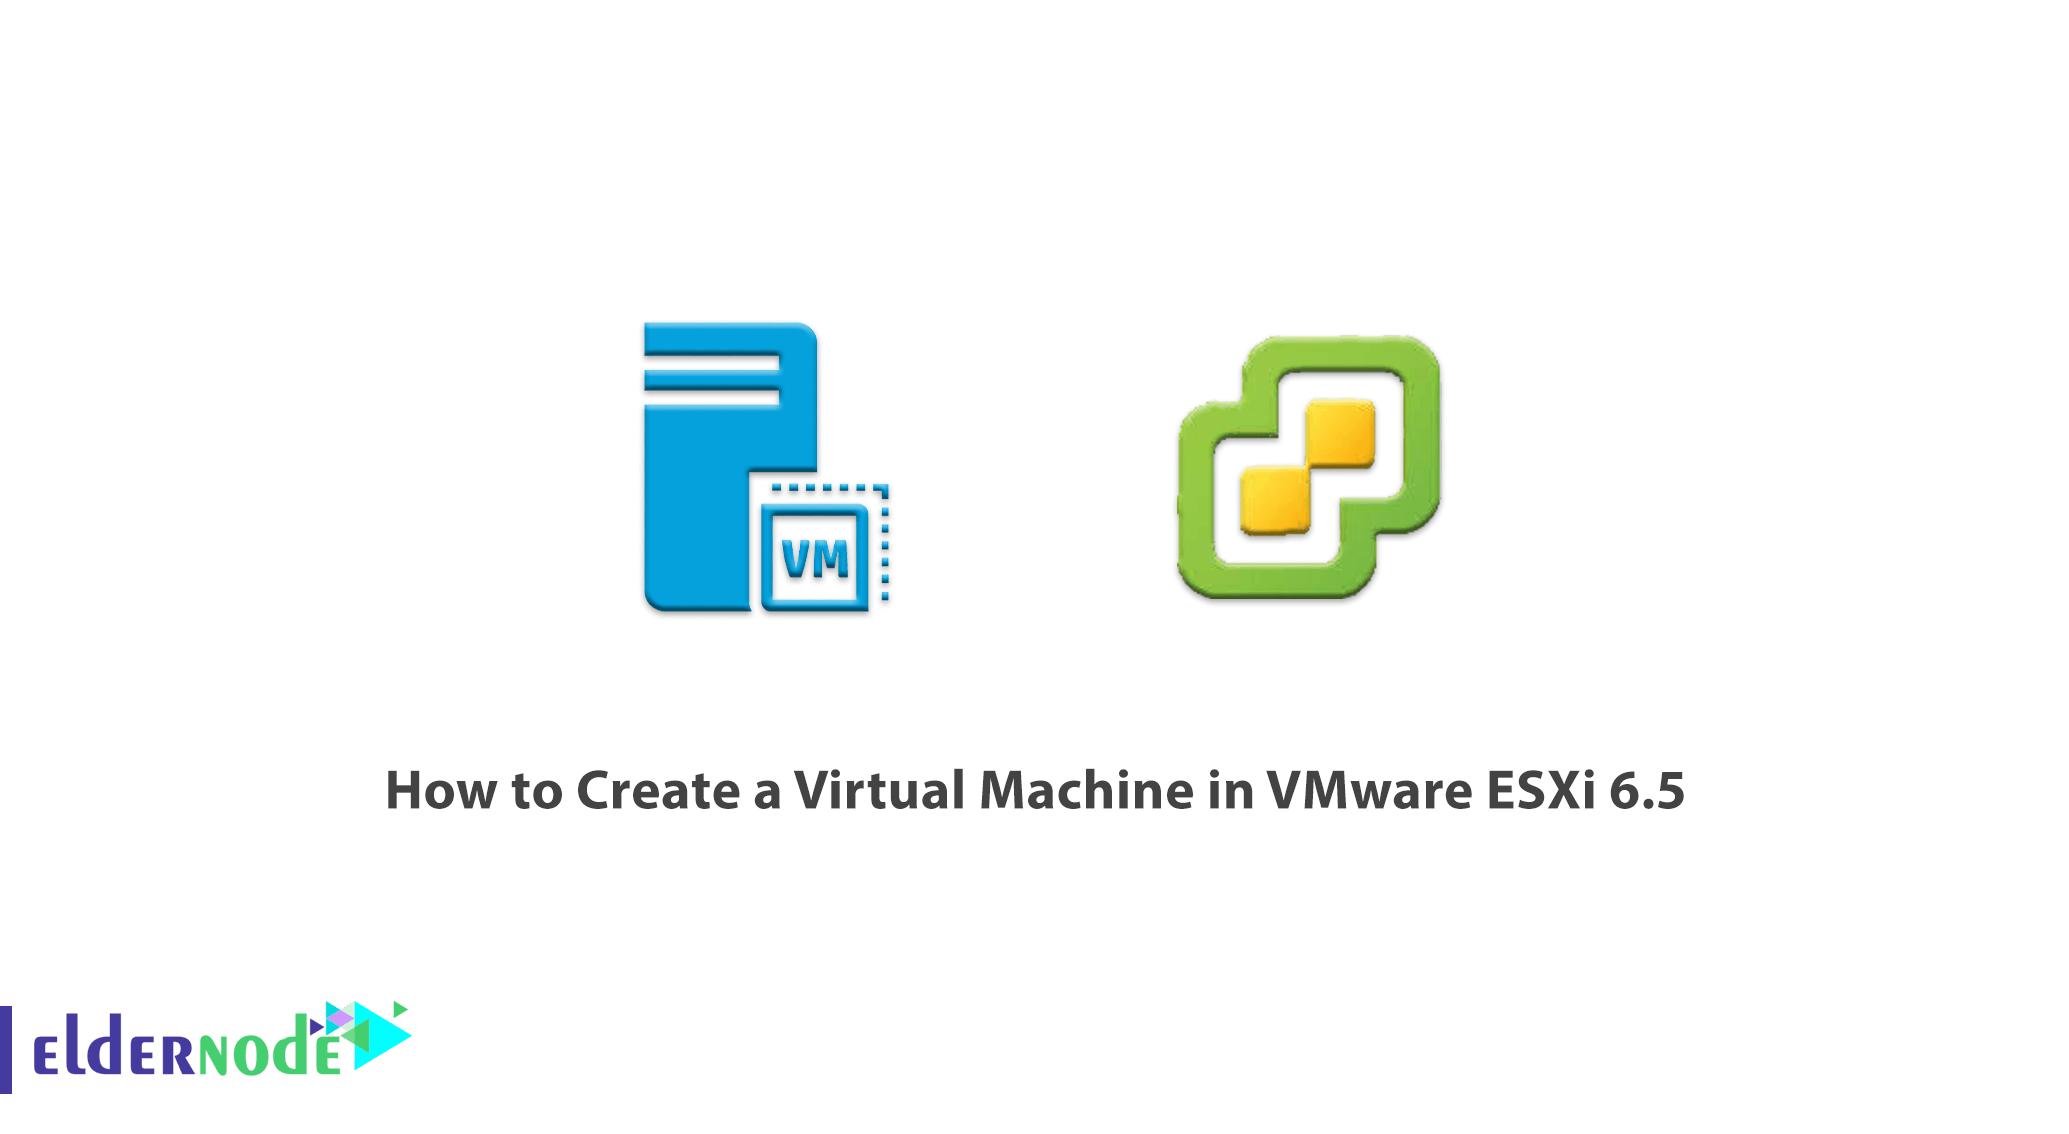 How to Create a Virtual Machine in VMware ESXi 6.5